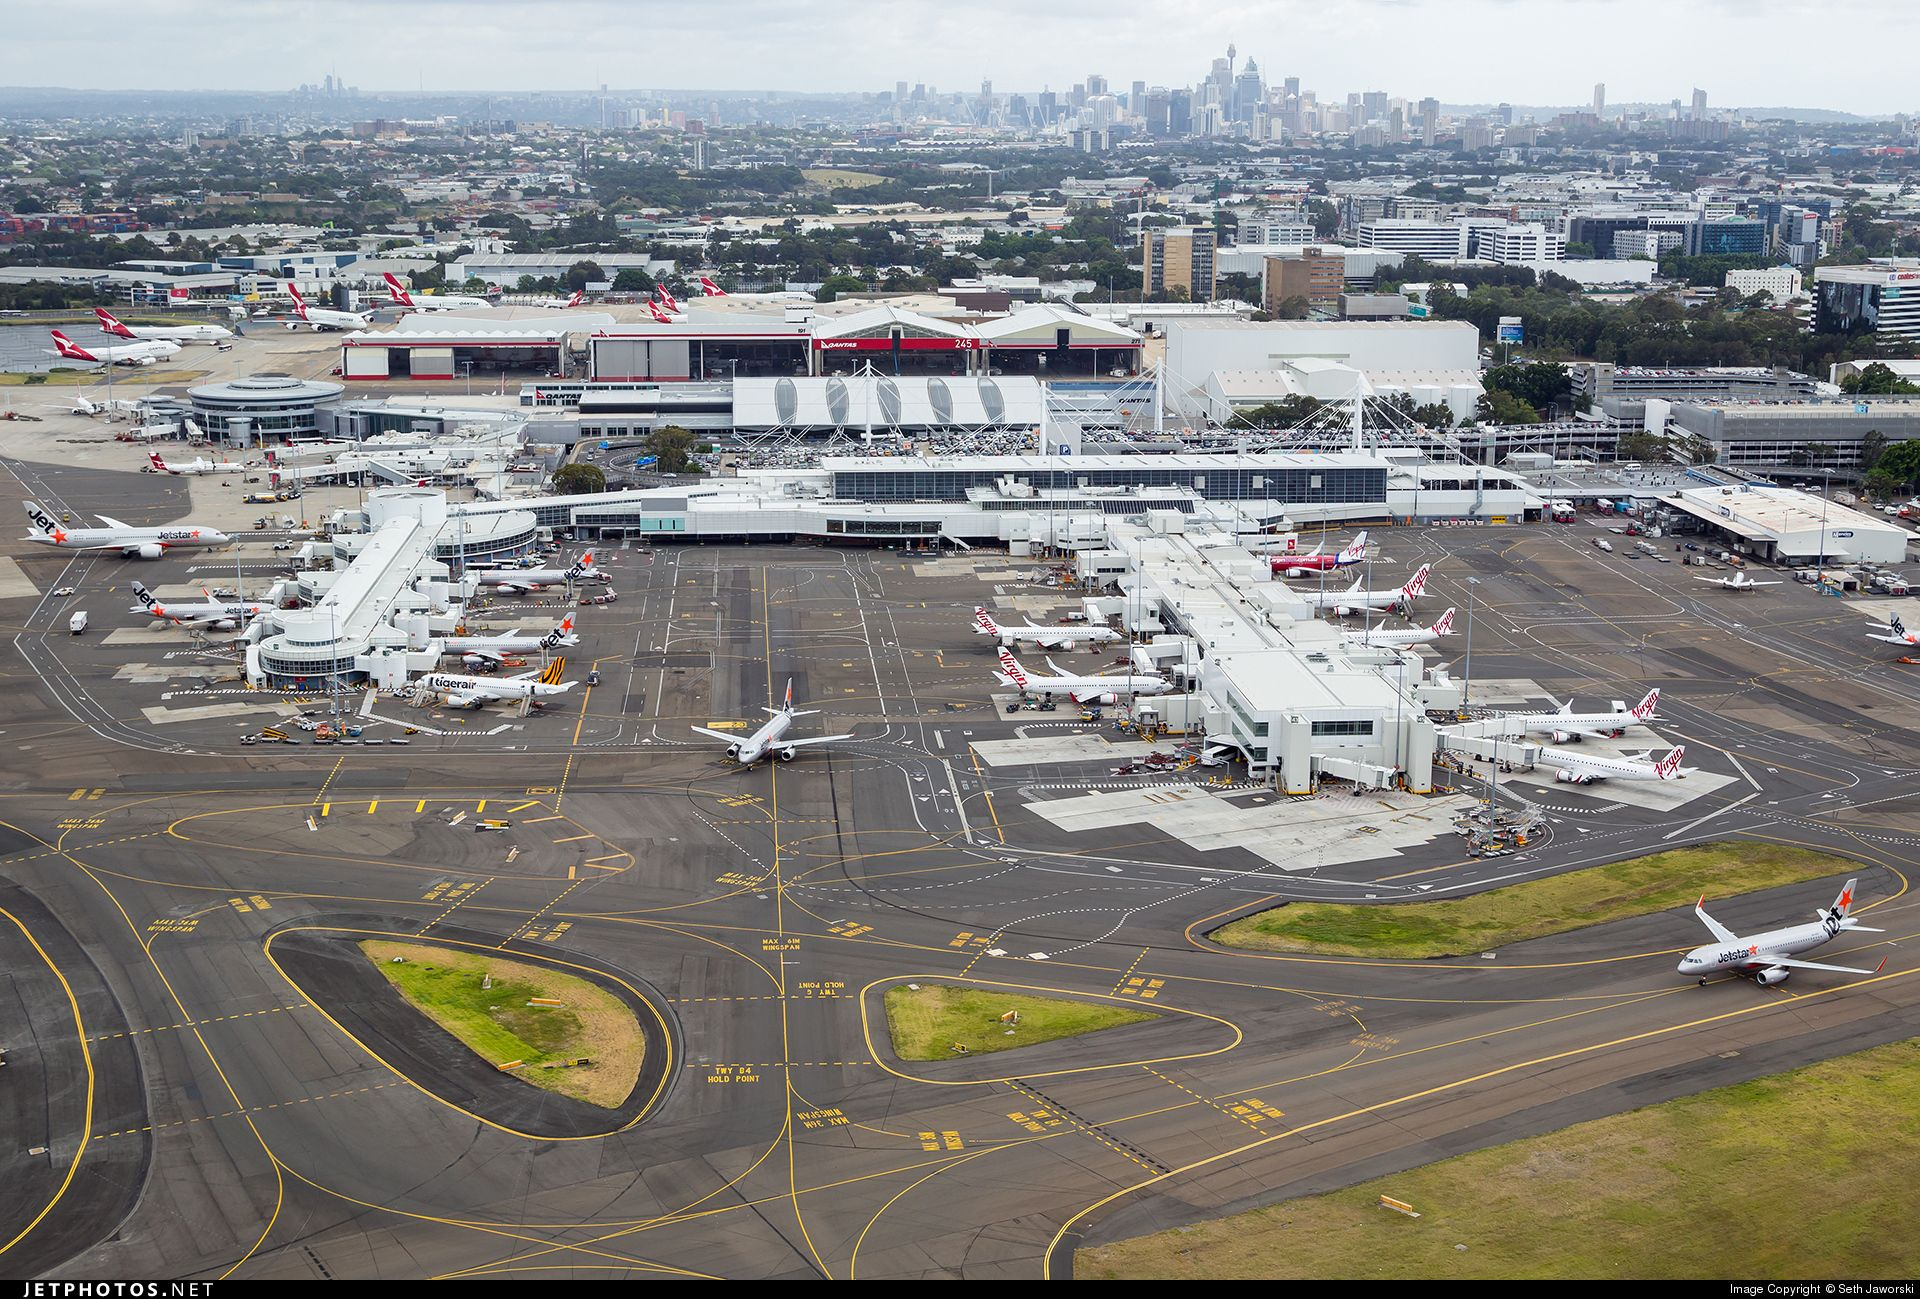 ebb84f12011ab8edaff3f4bcfa6697c8 - How To Get From International To Domestic Terminal Sydney